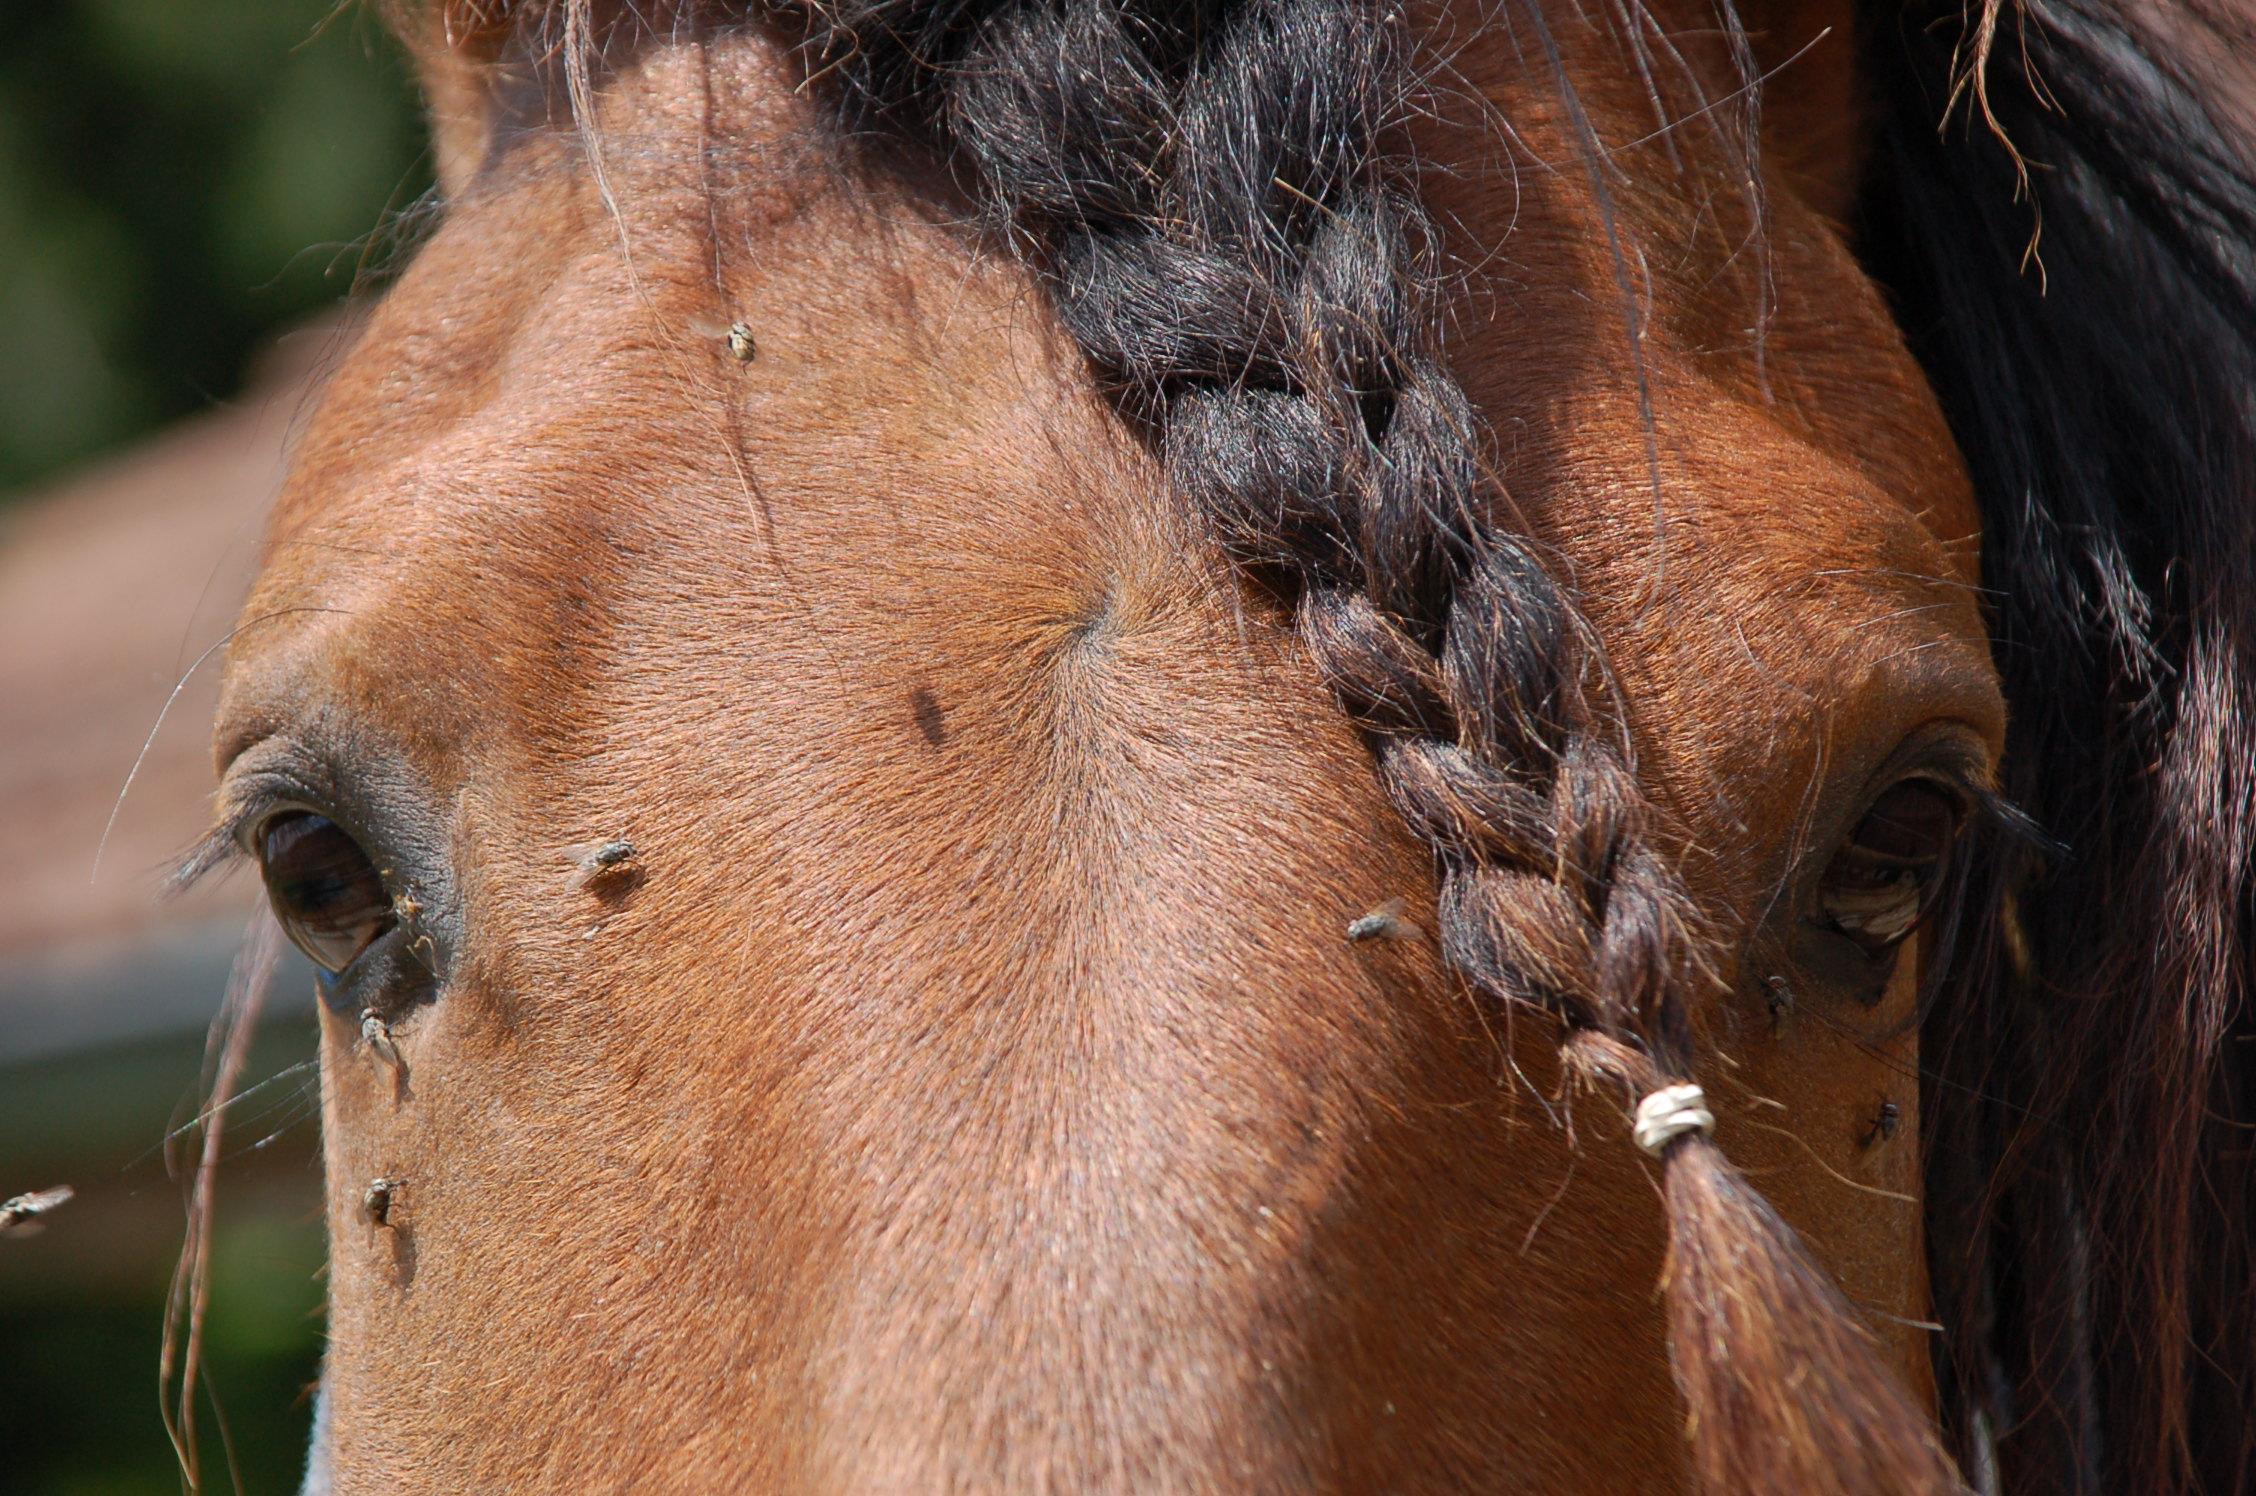 Insektenschutz - Hilfe gegen Fliegen beim Pferd